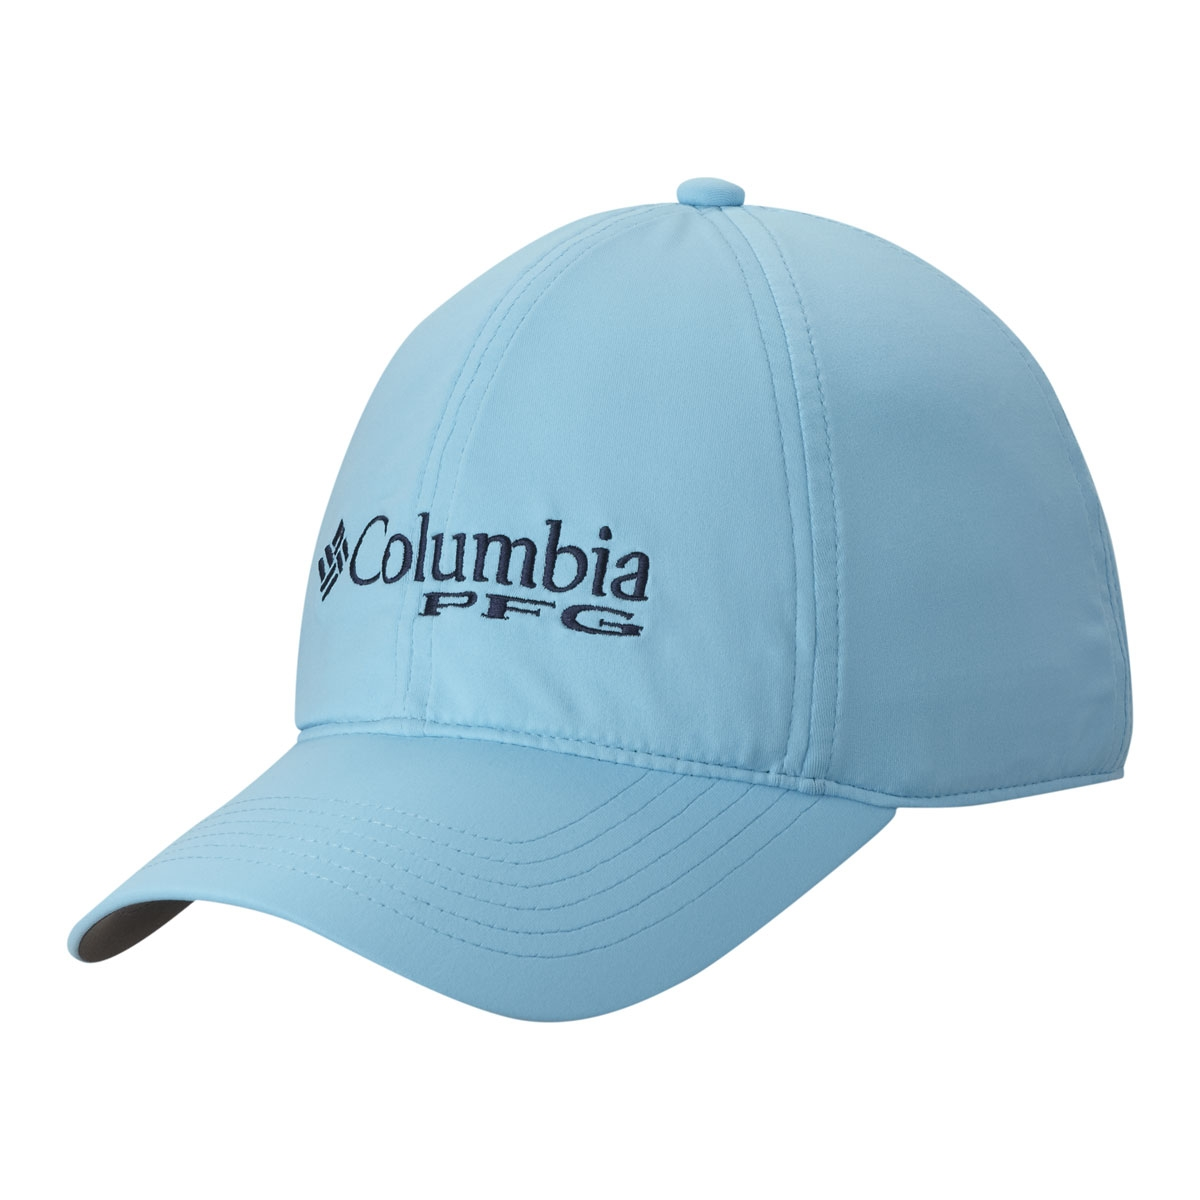 Image of Columbia PFG Coolhead Ballcap III - Bounty Blue 8d3be6f712b